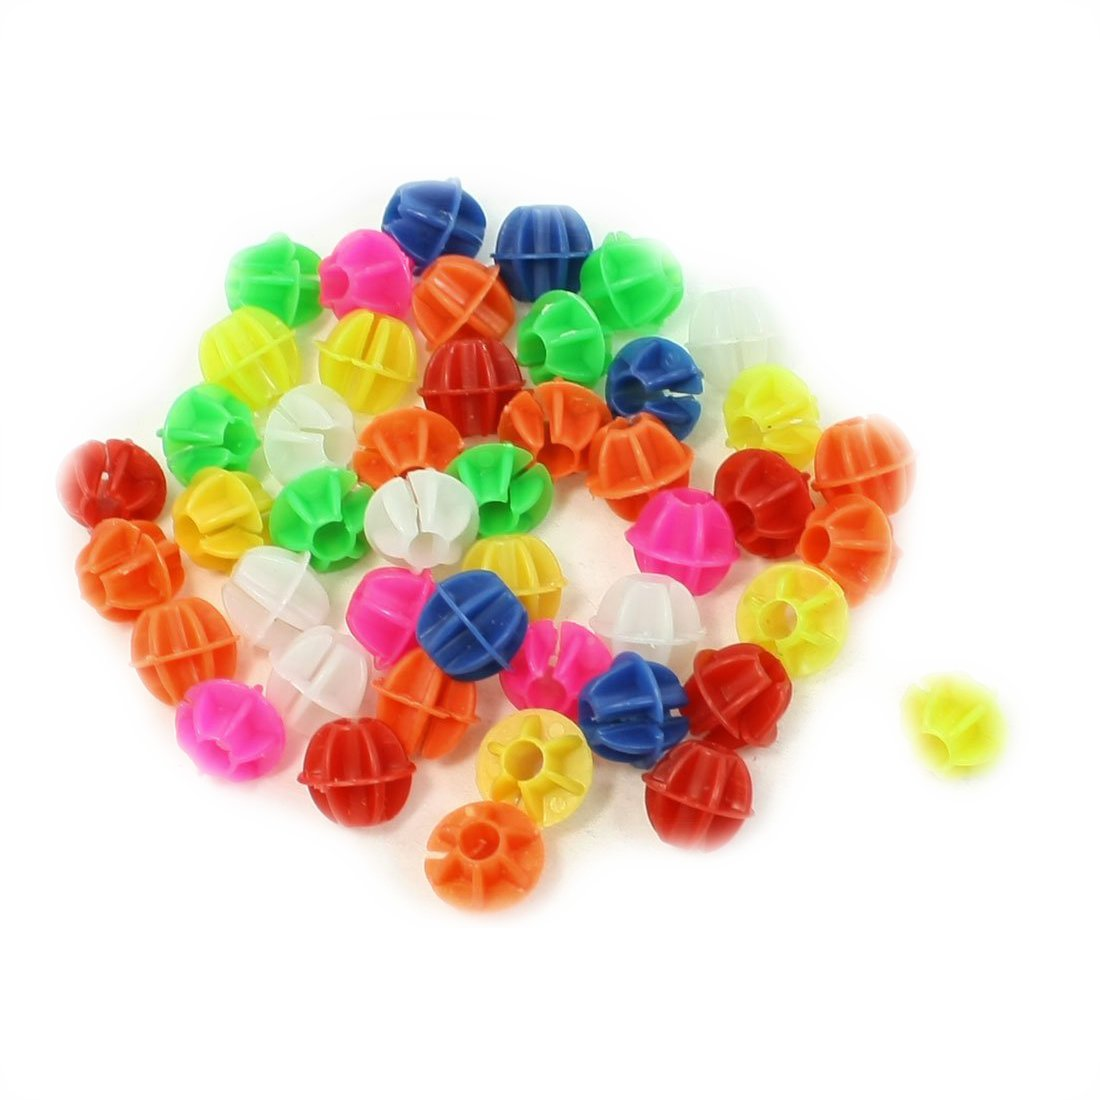 TRIXES Multicoloured Bicycle Spokey Dokey Beads